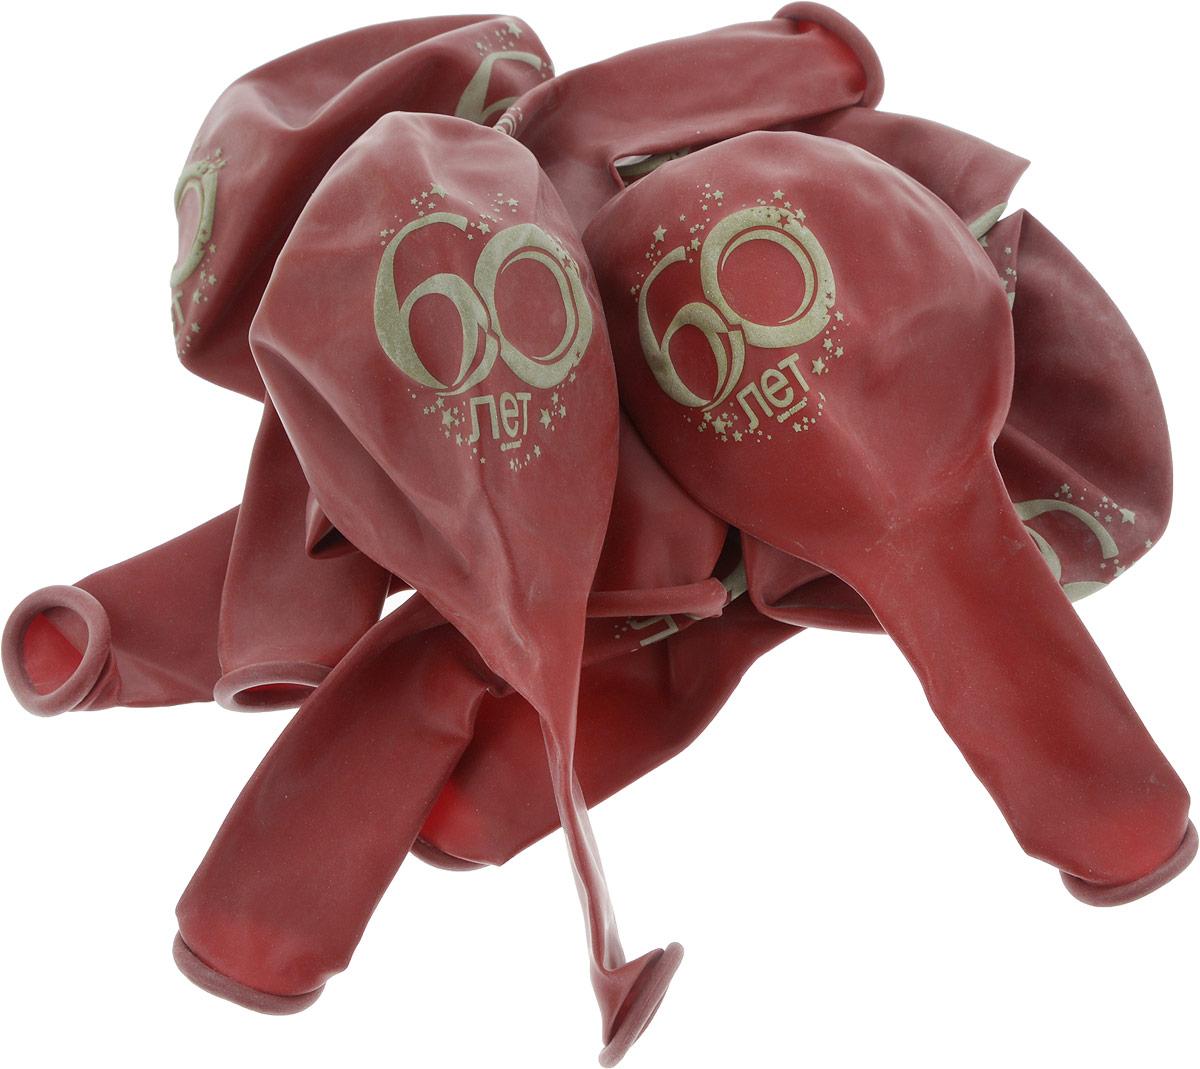 Latex Occidental Набор воздушных шариков Юбилей цифра 60 10 шт